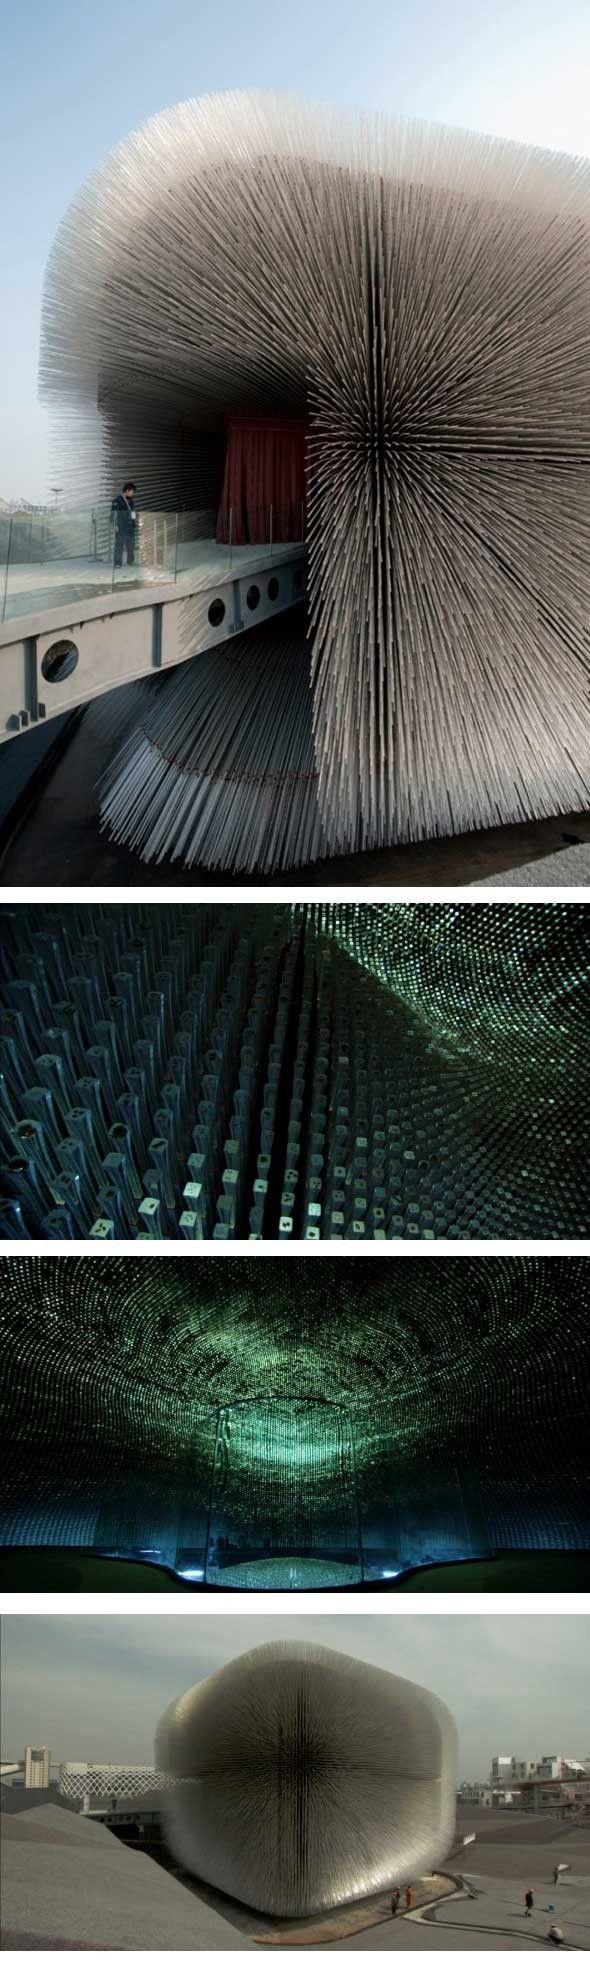 Pavillon anglais exposition universelle Shanghai 2010